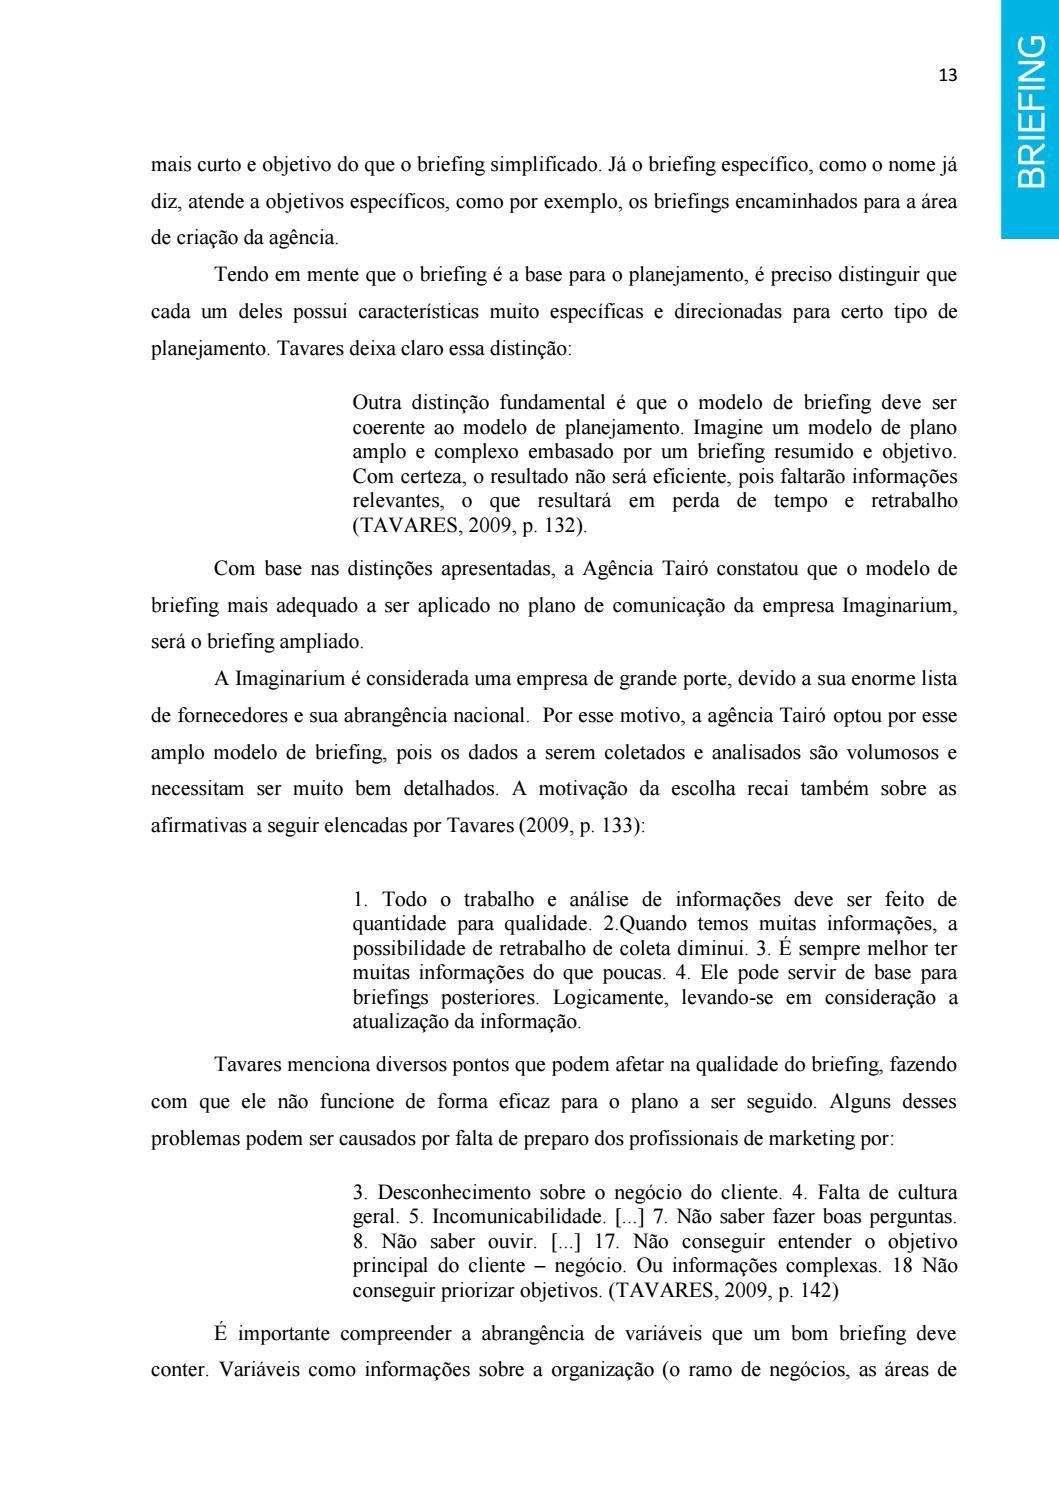 TCC - Imaginarium (Agência Tairó) by Glenda Conrad - issuu